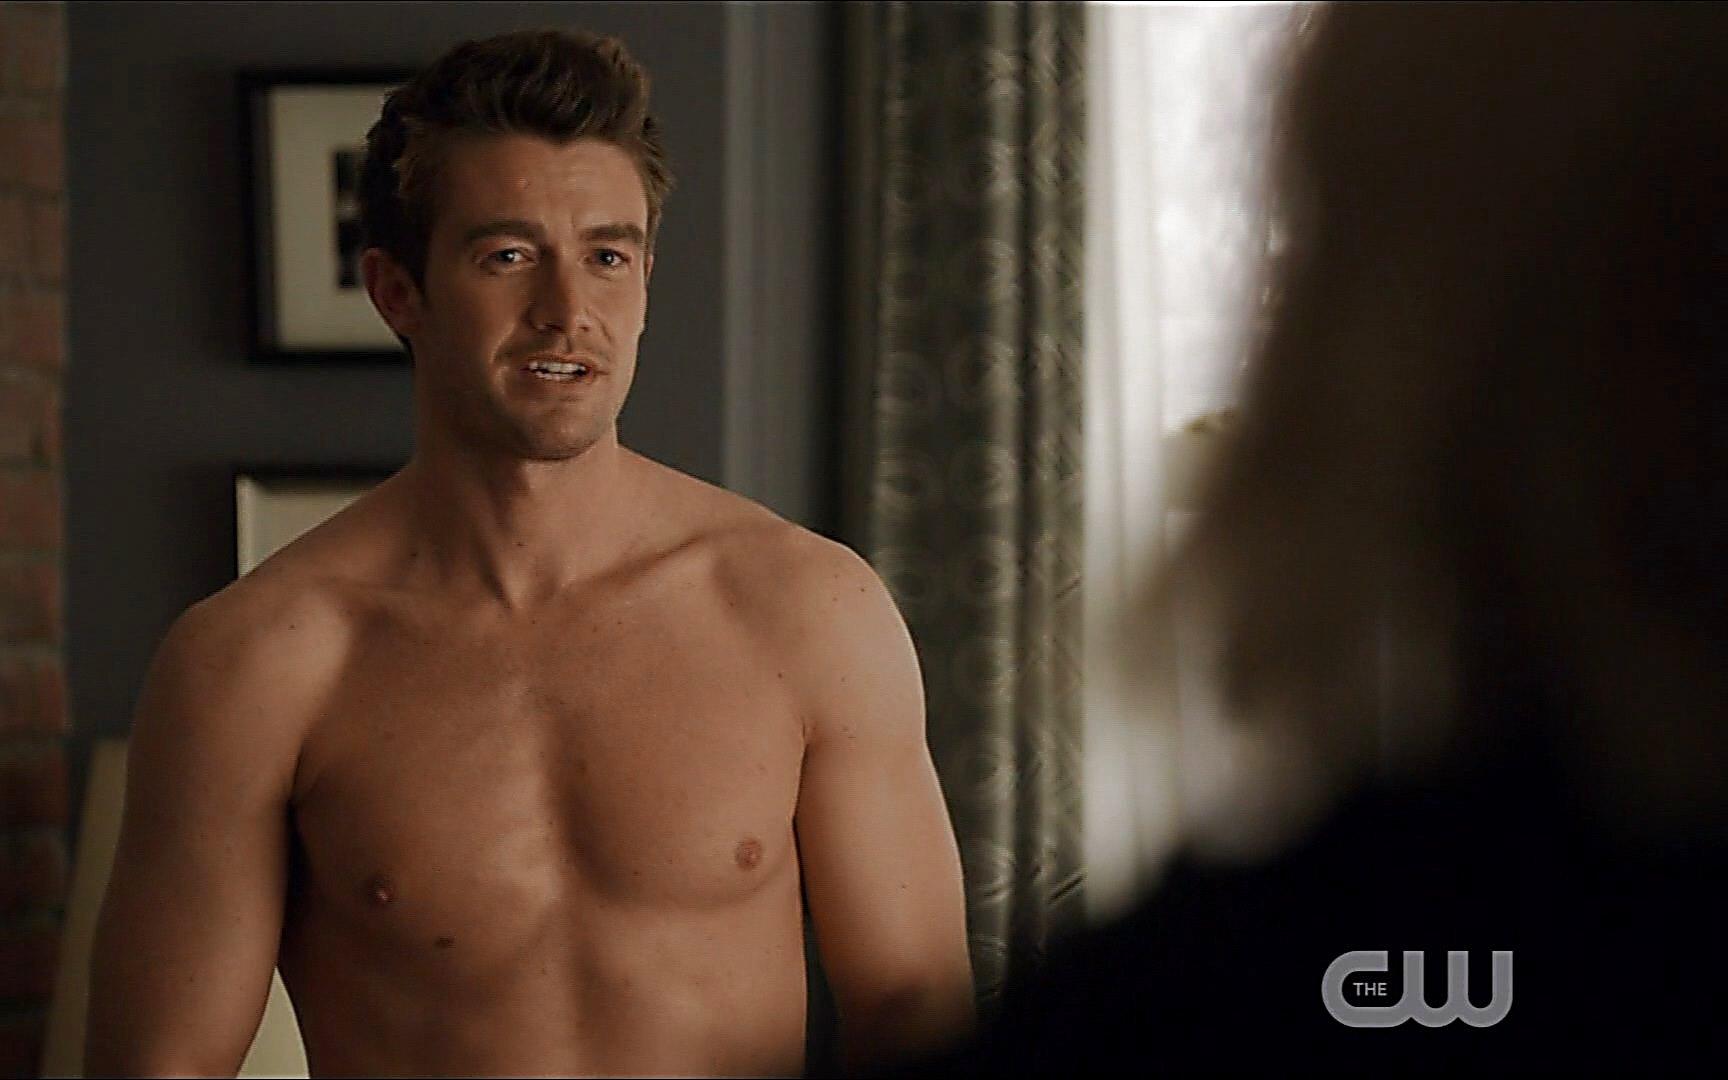 Robert Buckley sexy shirtless scene July 18, 2015, 1pm